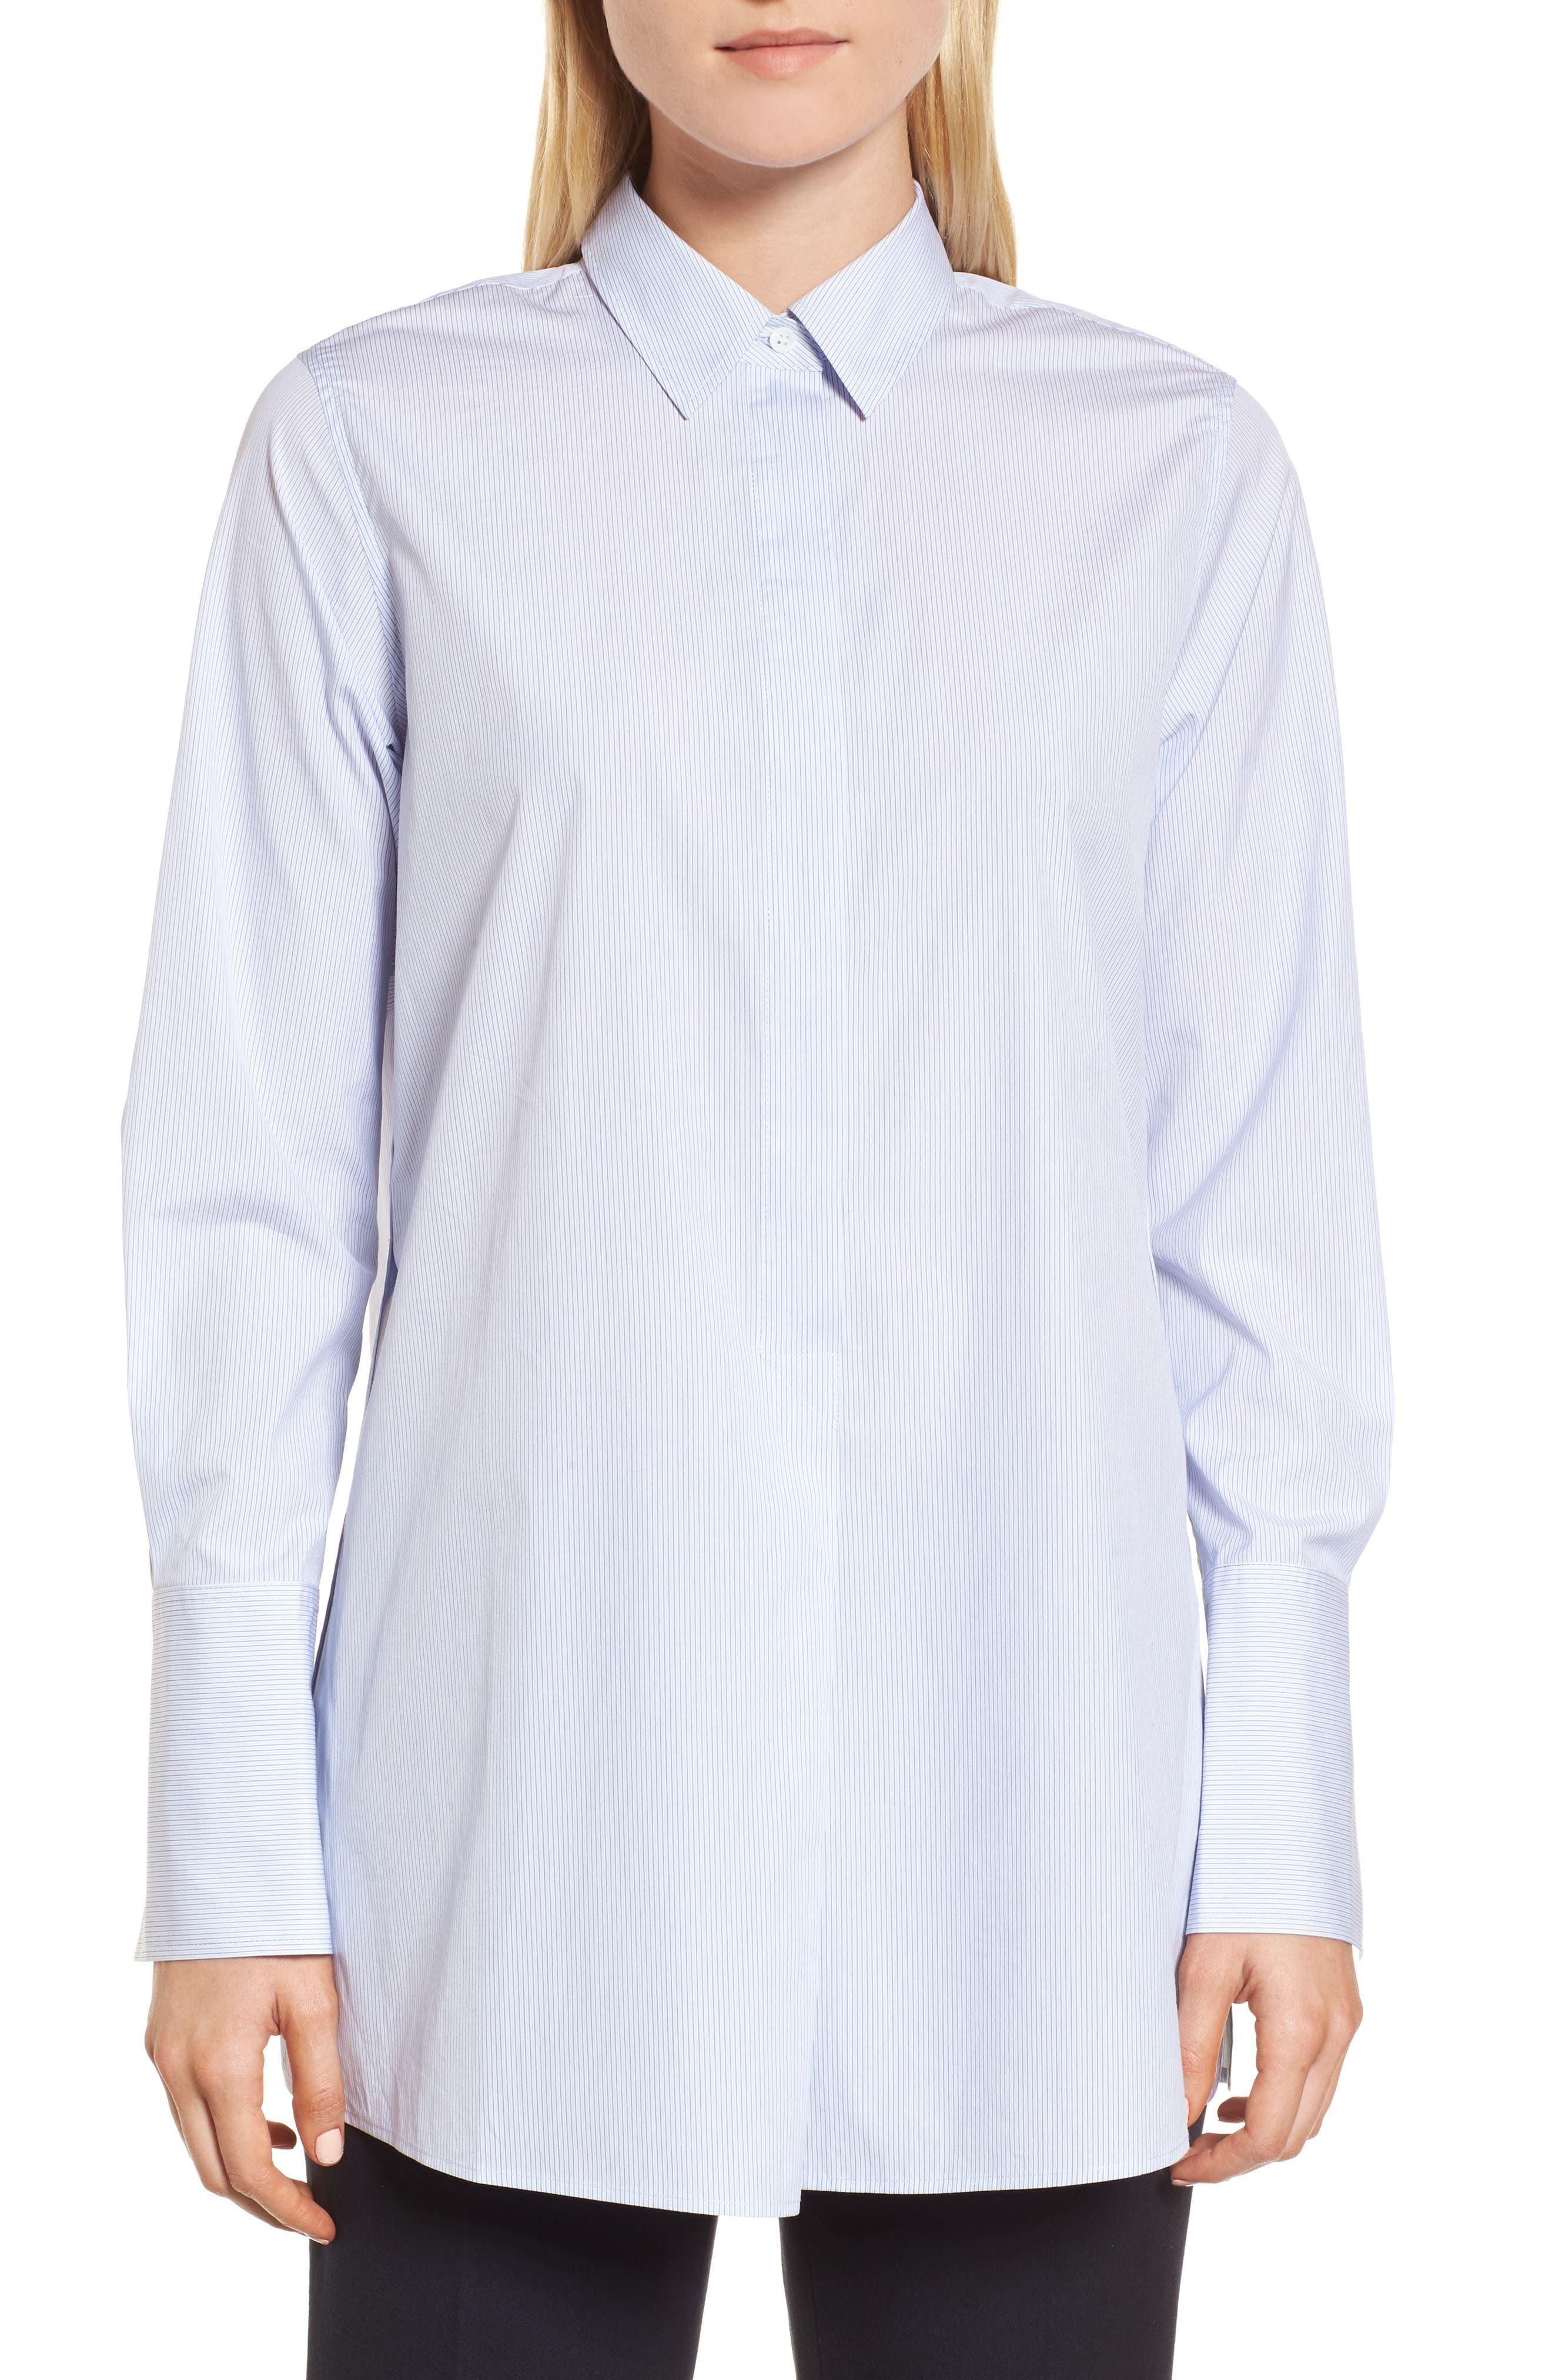 Popover Poplin Shirt,                             Main thumbnail 1, color,                             Blue- White Stripe